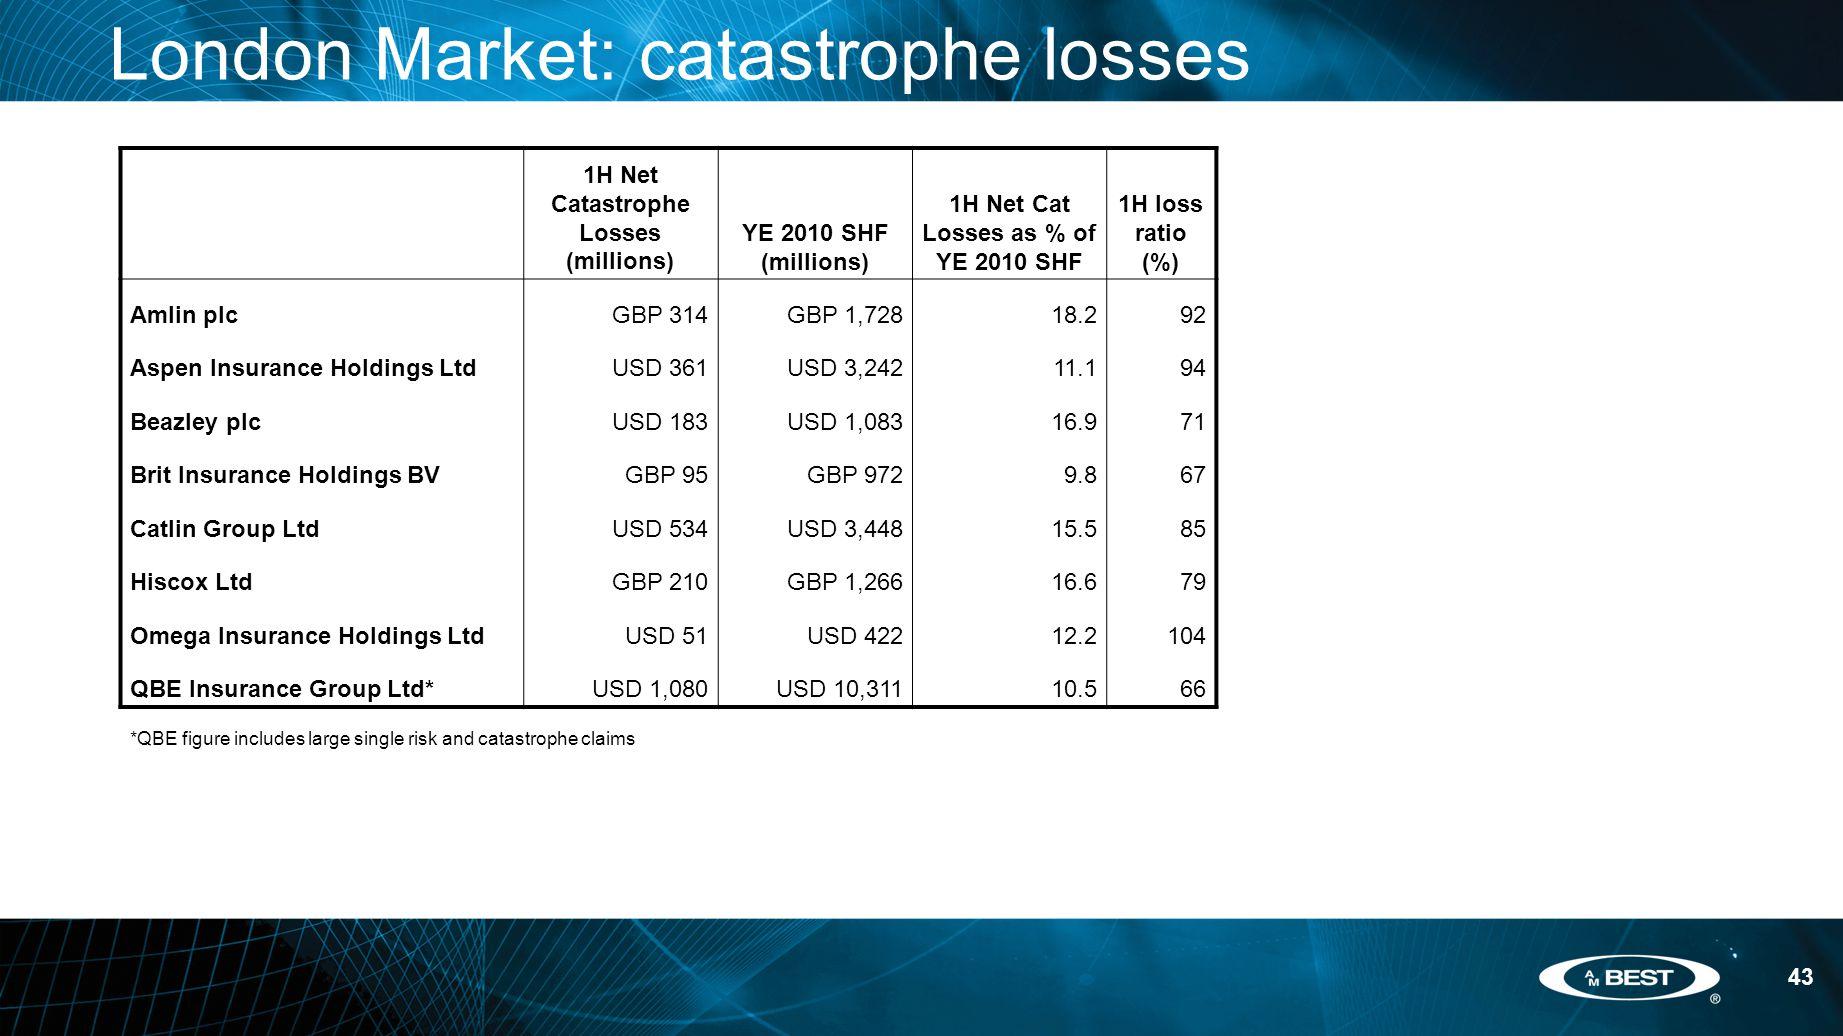 43 London Market: catastrophe losses 1H Net Catastrophe Losses (millions) YE 2010 SHF (millions) 1H Net Cat Losses as % of YE 2010 SHF 1H loss ratio (%) Amlin plcGBP 314GBP 1,72818.292 Aspen Insurance Holdings LtdUSD 361USD 3,24211.194 Beazley plcUSD 183USD 1,08316.971 Brit Insurance Holdings BVGBP 95GBP 9729.867 Catlin Group LtdUSD 534USD 3,44815.585 Hiscox LtdGBP 210GBP 1,26616.679 Omega Insurance Holdings LtdUSD 51USD 42212.2104 QBE Insurance Group Ltd*USD 1,080USD 10,31110.566 *QBE figure includes large single risk and catastrophe claims